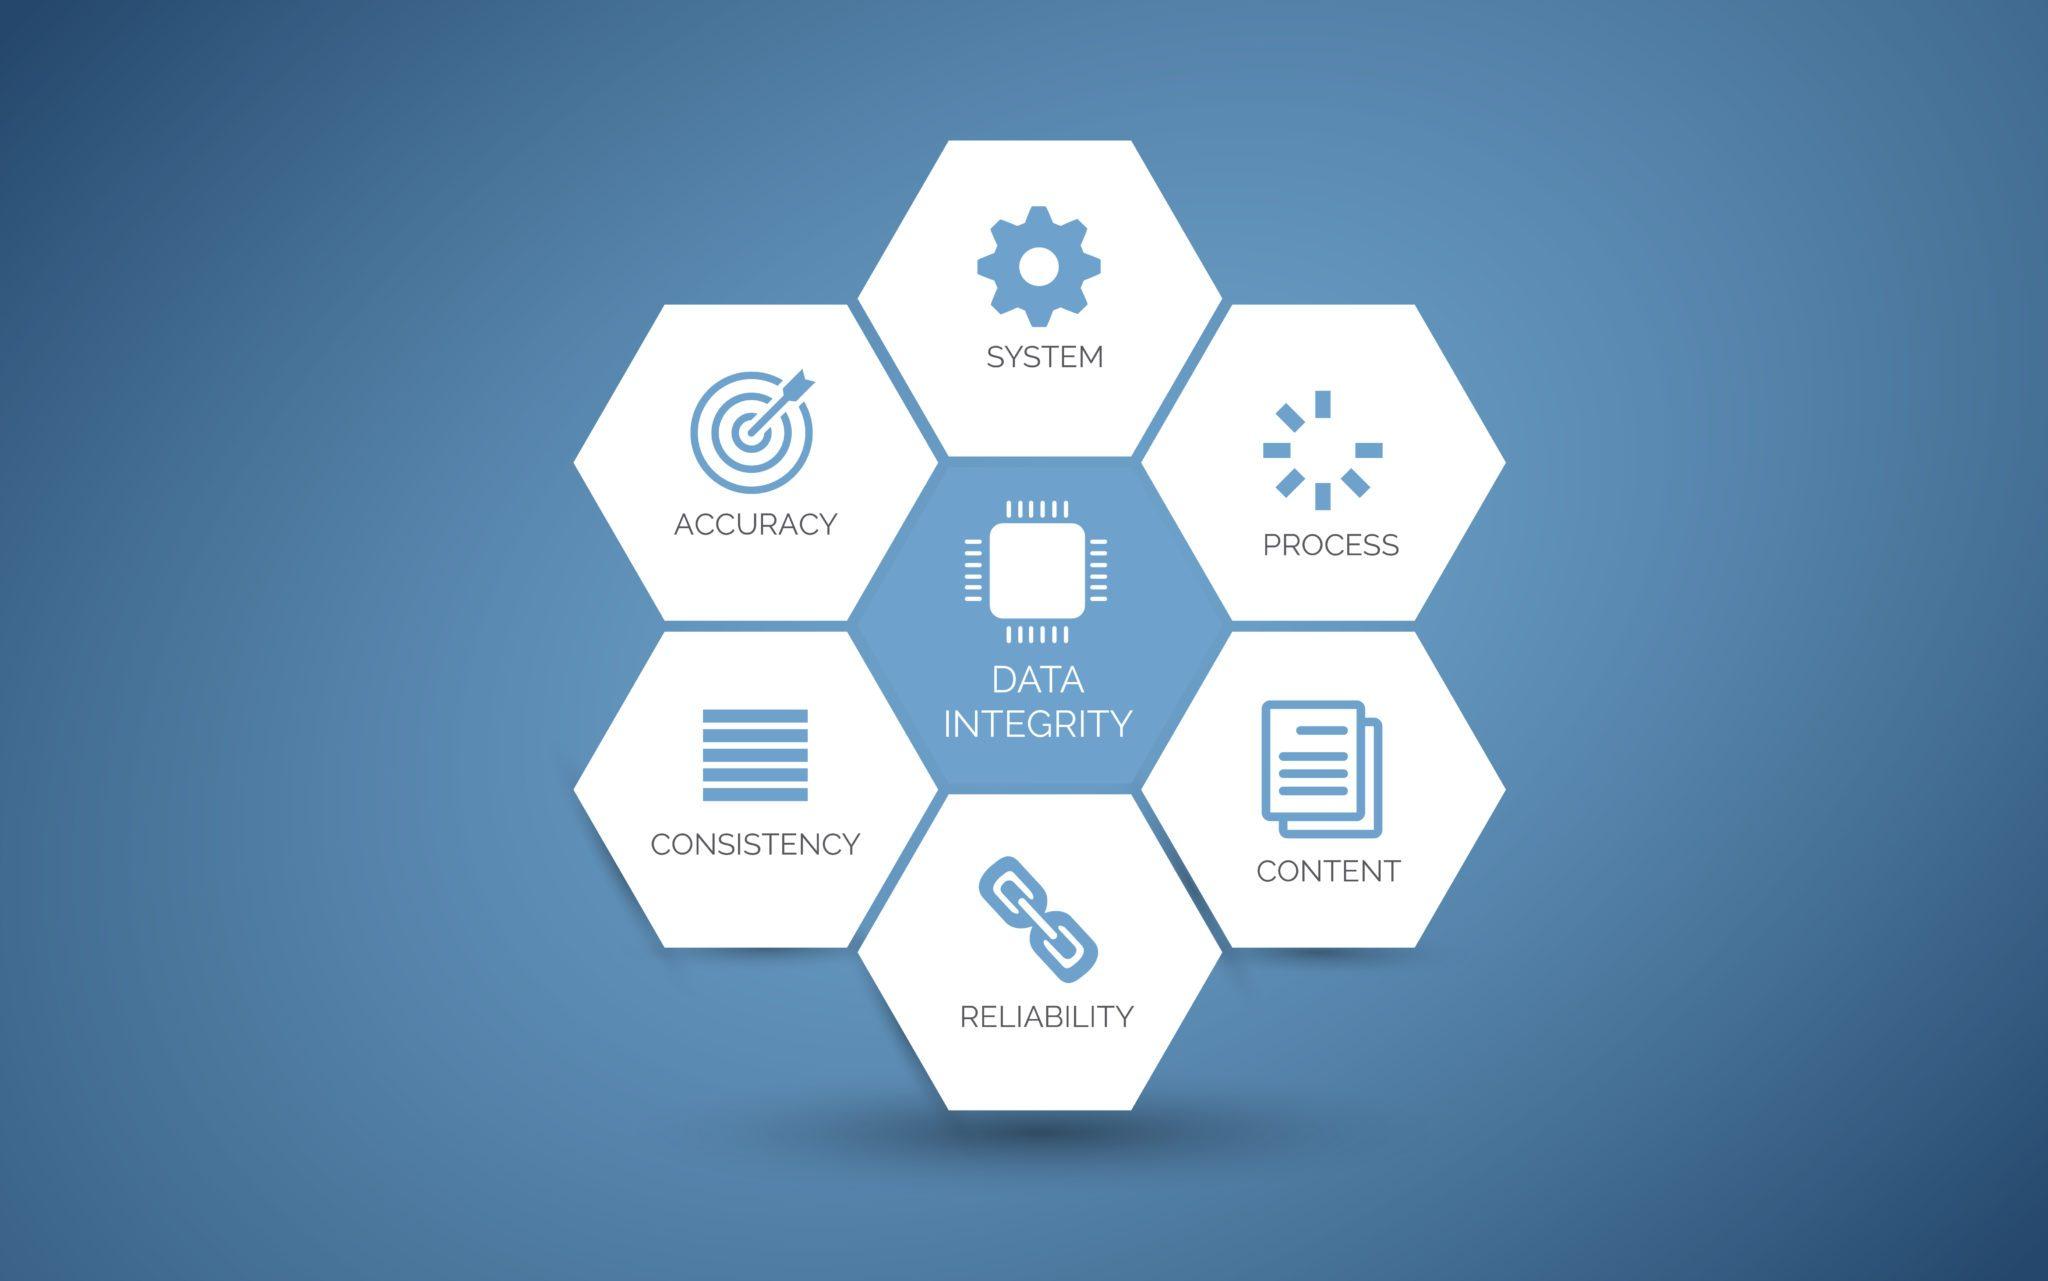 Caradigm, RightPatient Partner to Offer SSO & Biometric Patient Identification